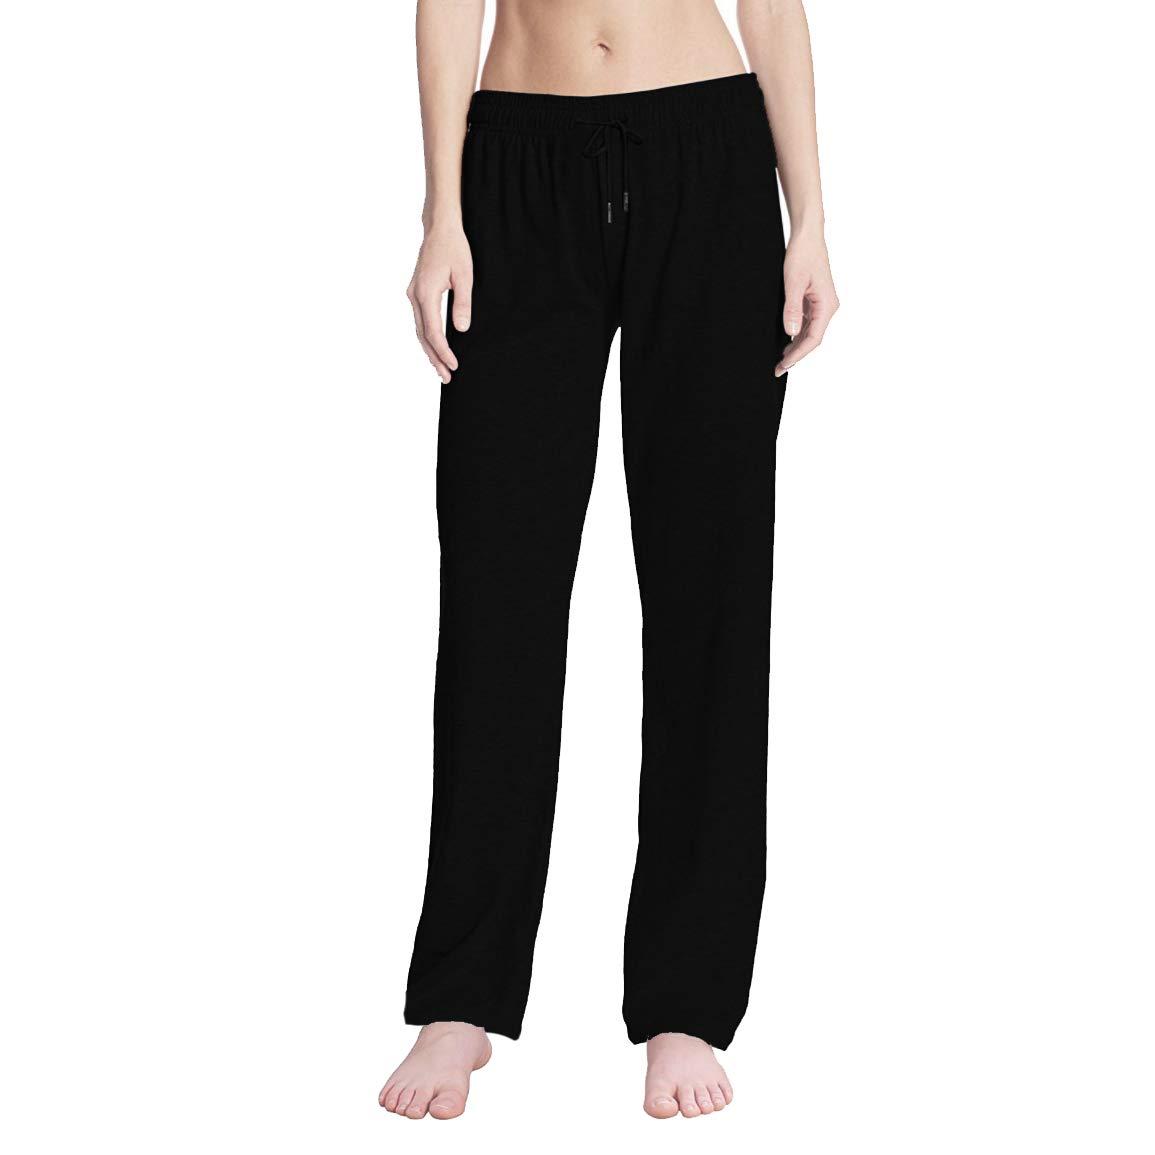 Black Need DODO Women's Mudale Pajama Pants Casual Sleep Lounge Pants